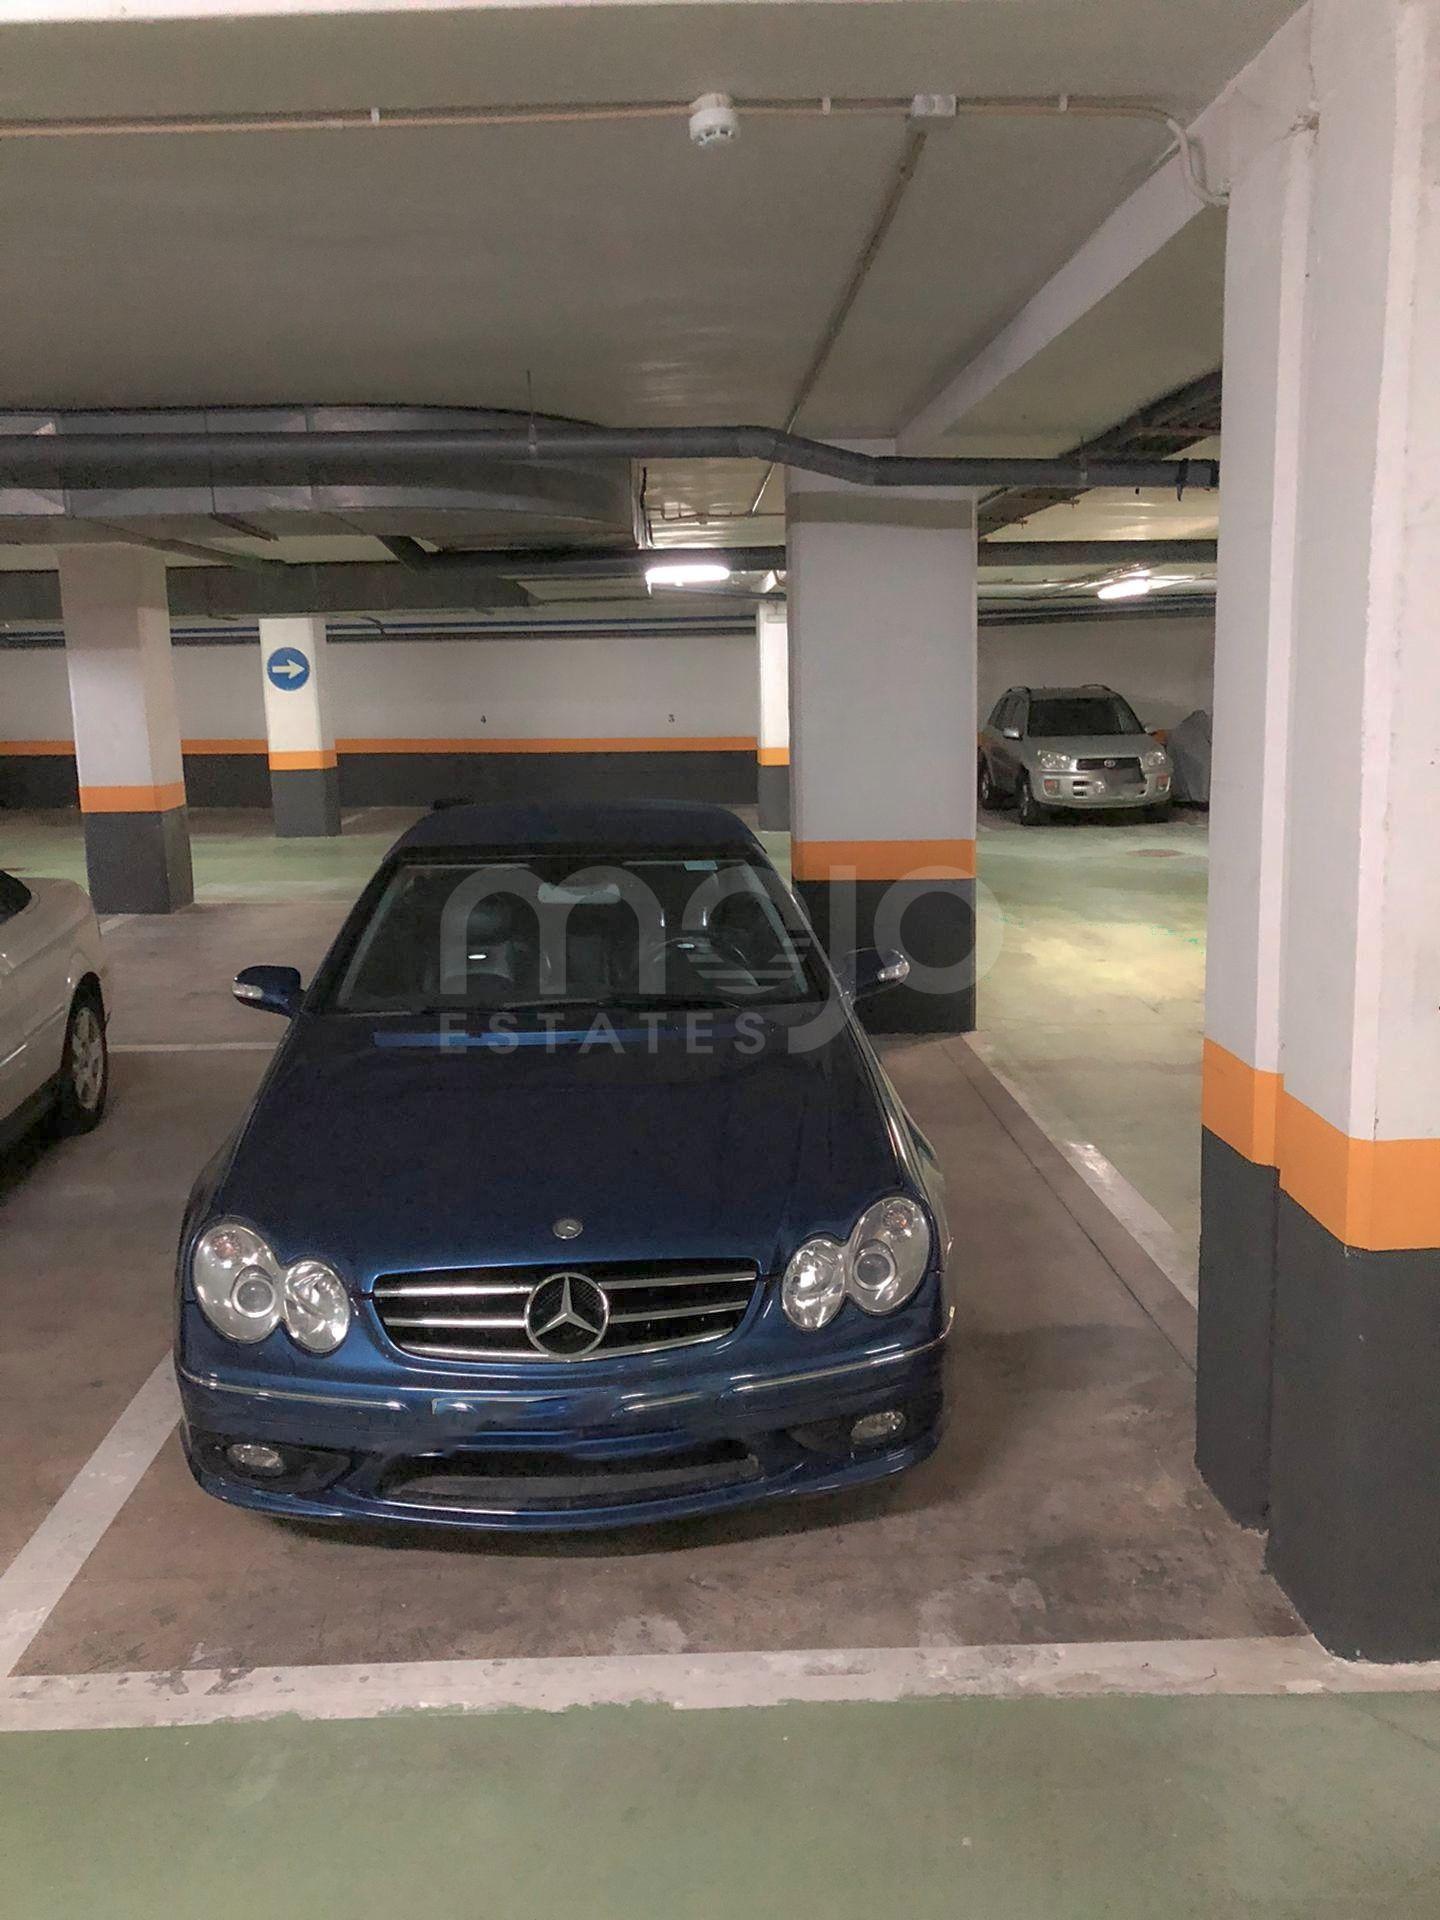 Plaza de parking en garaje céntrico